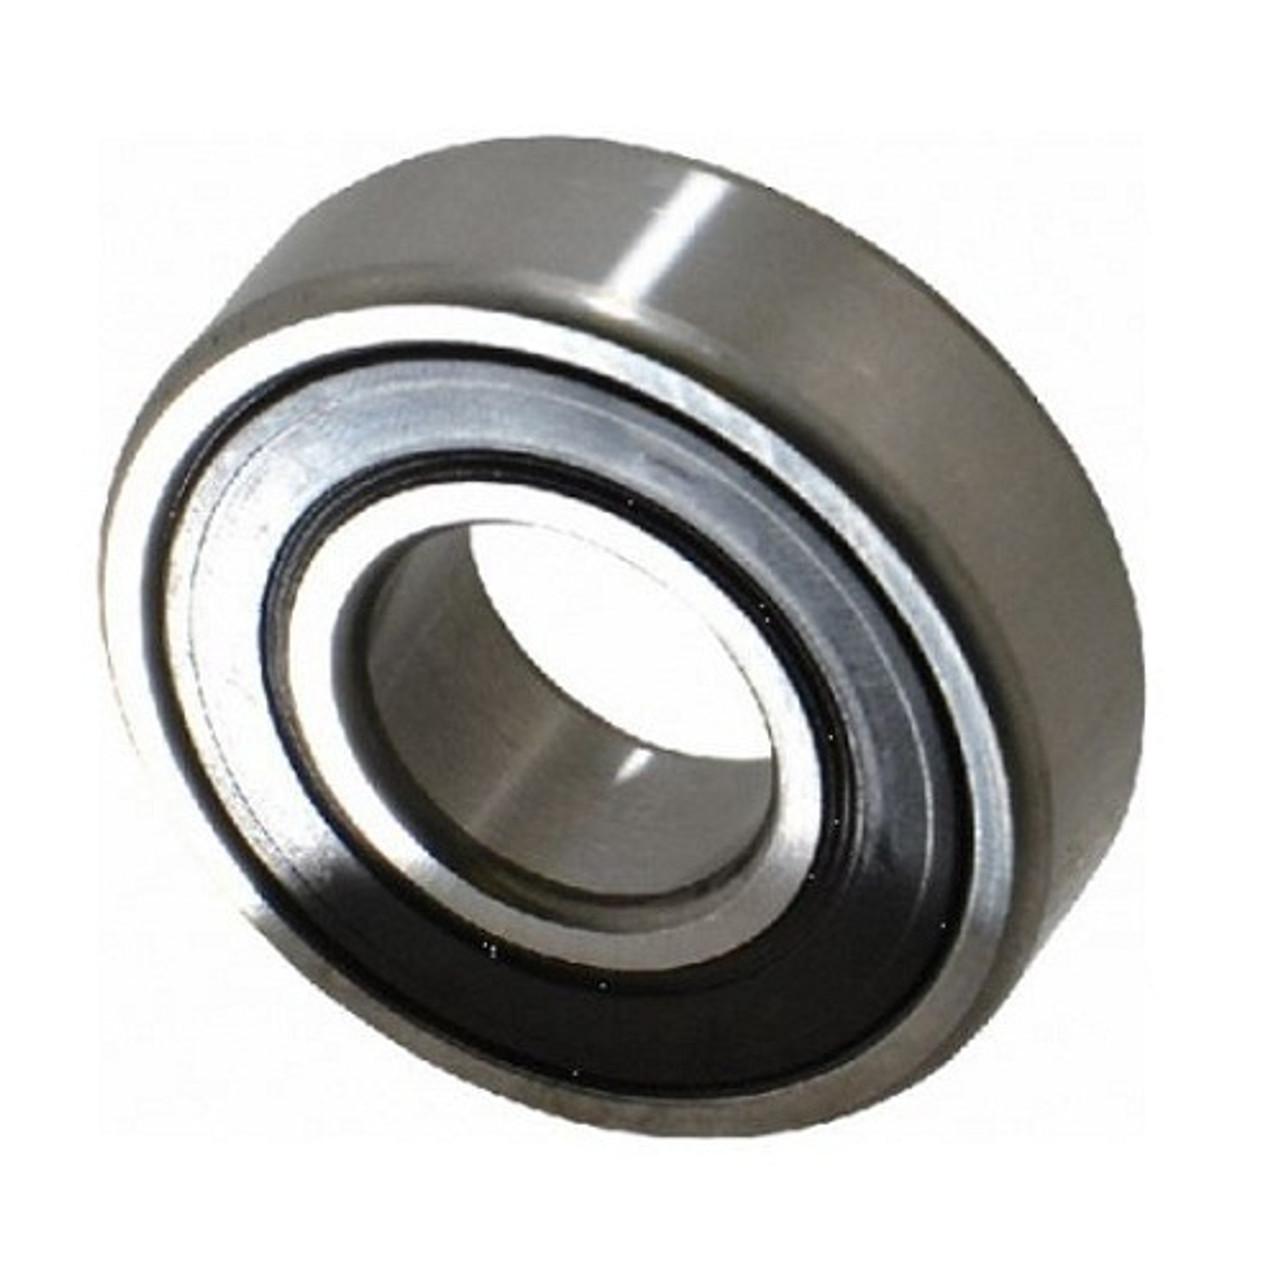 Ball Bearing 6203 for ATA110B 102788